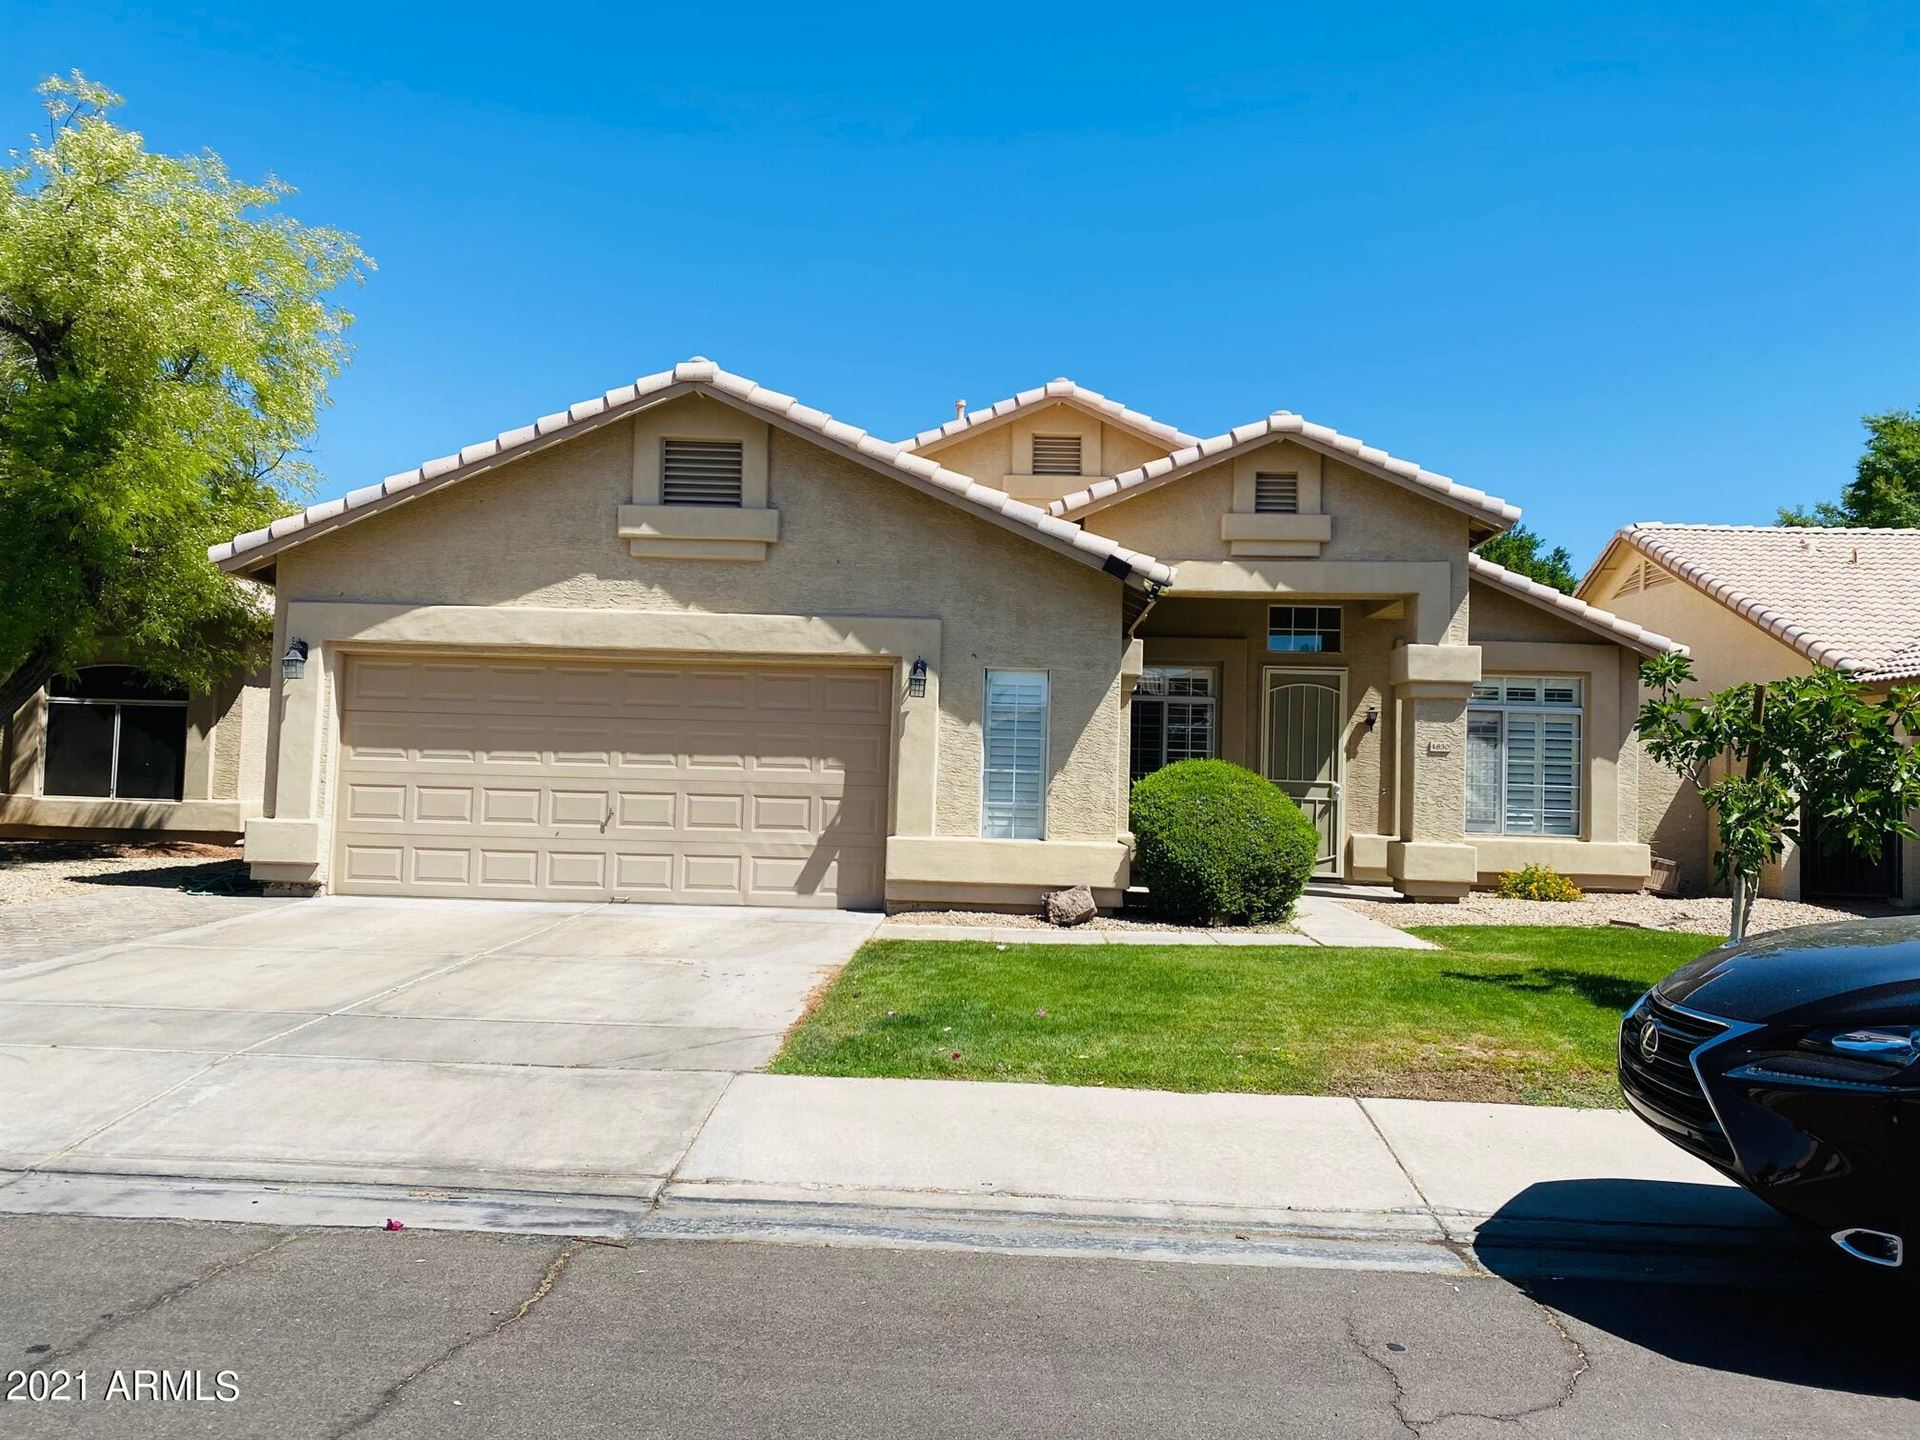 4830 W Flint Street, Chandler, AZ 85226 - MLS#: 6232018